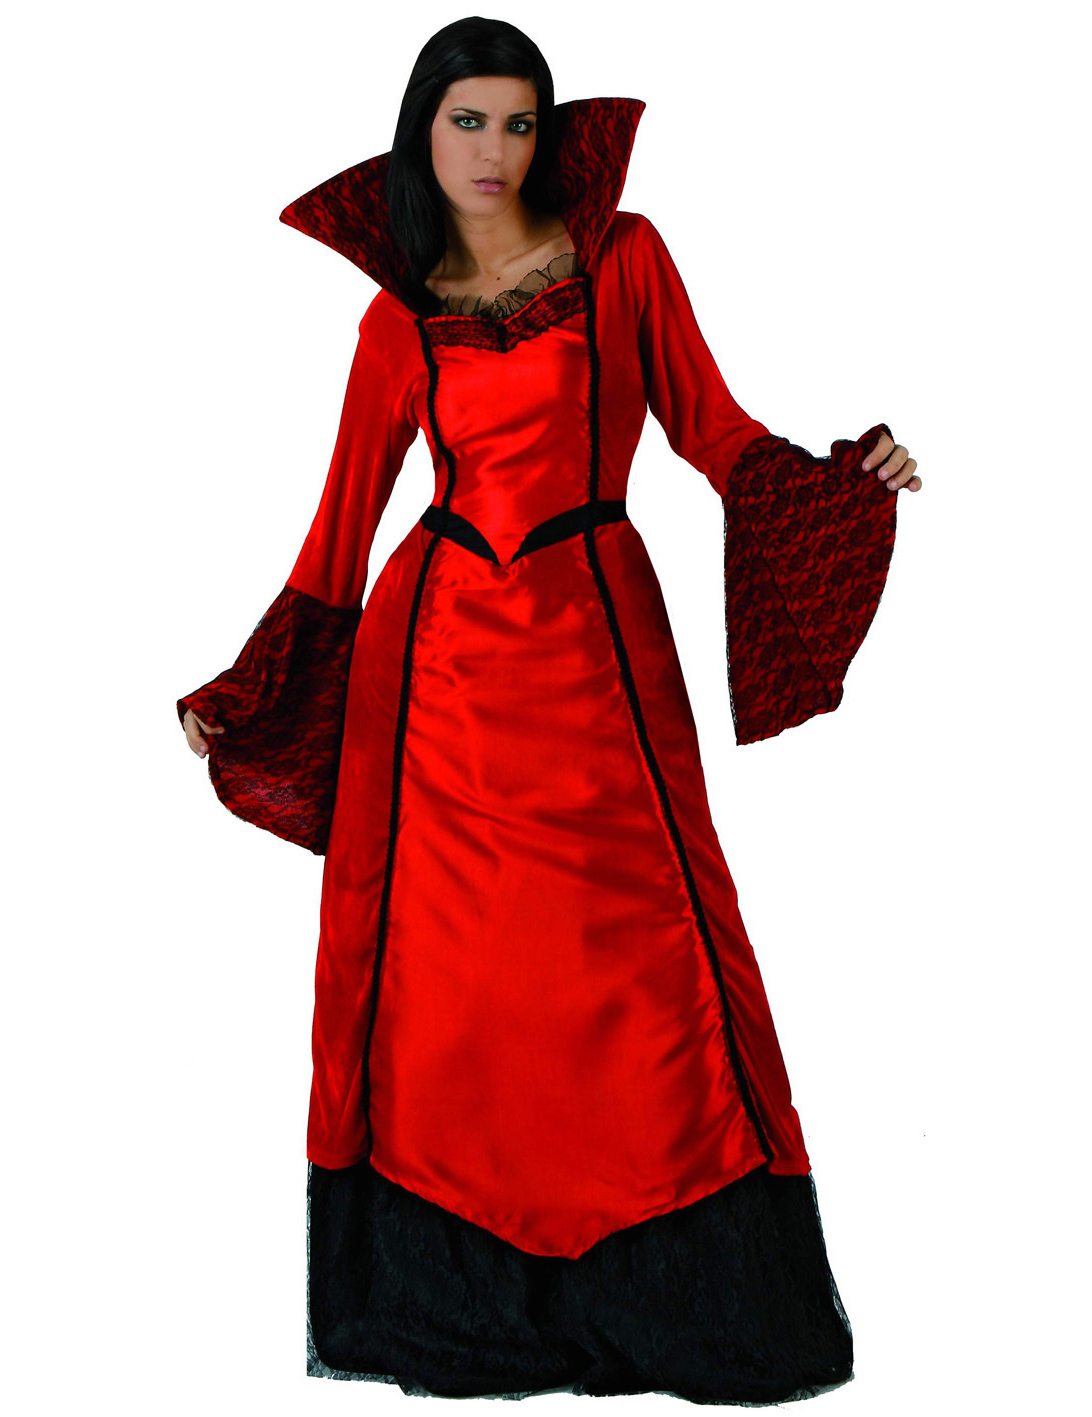 Vampire costume - Costume vampire femme ...